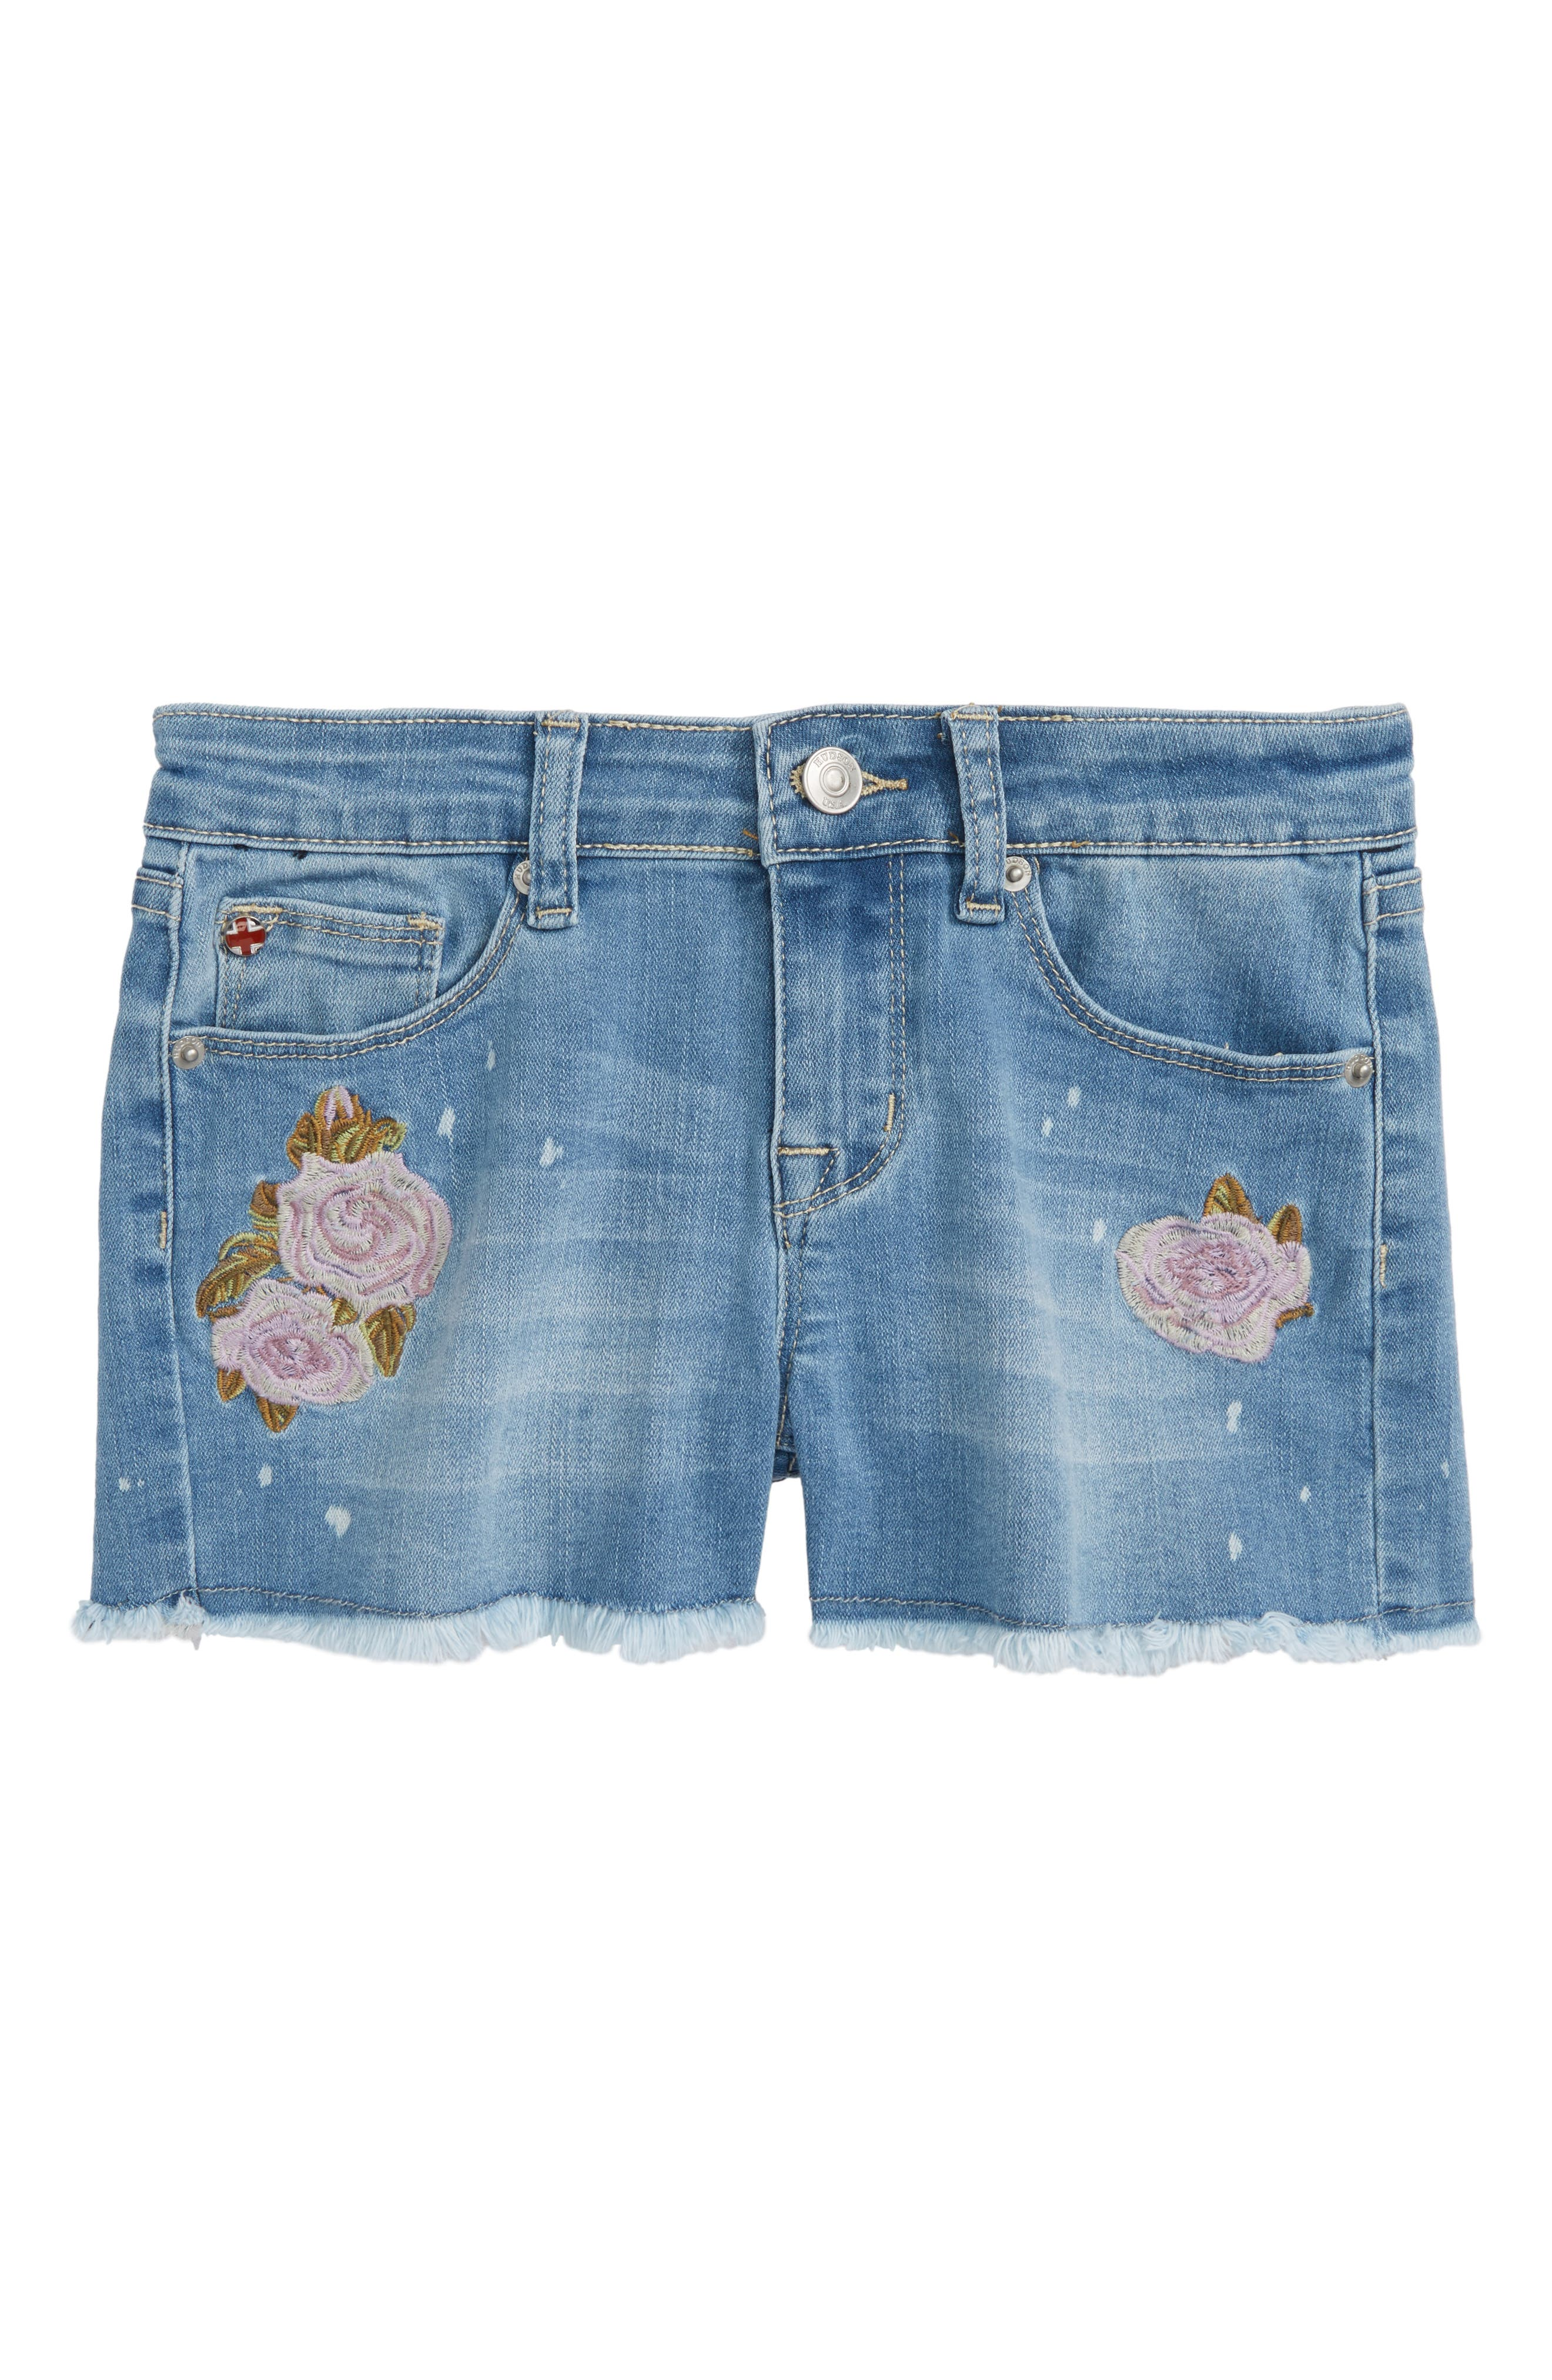 Floral Appliqué Fray Shorts,                         Main,                         color, Whatever Wash